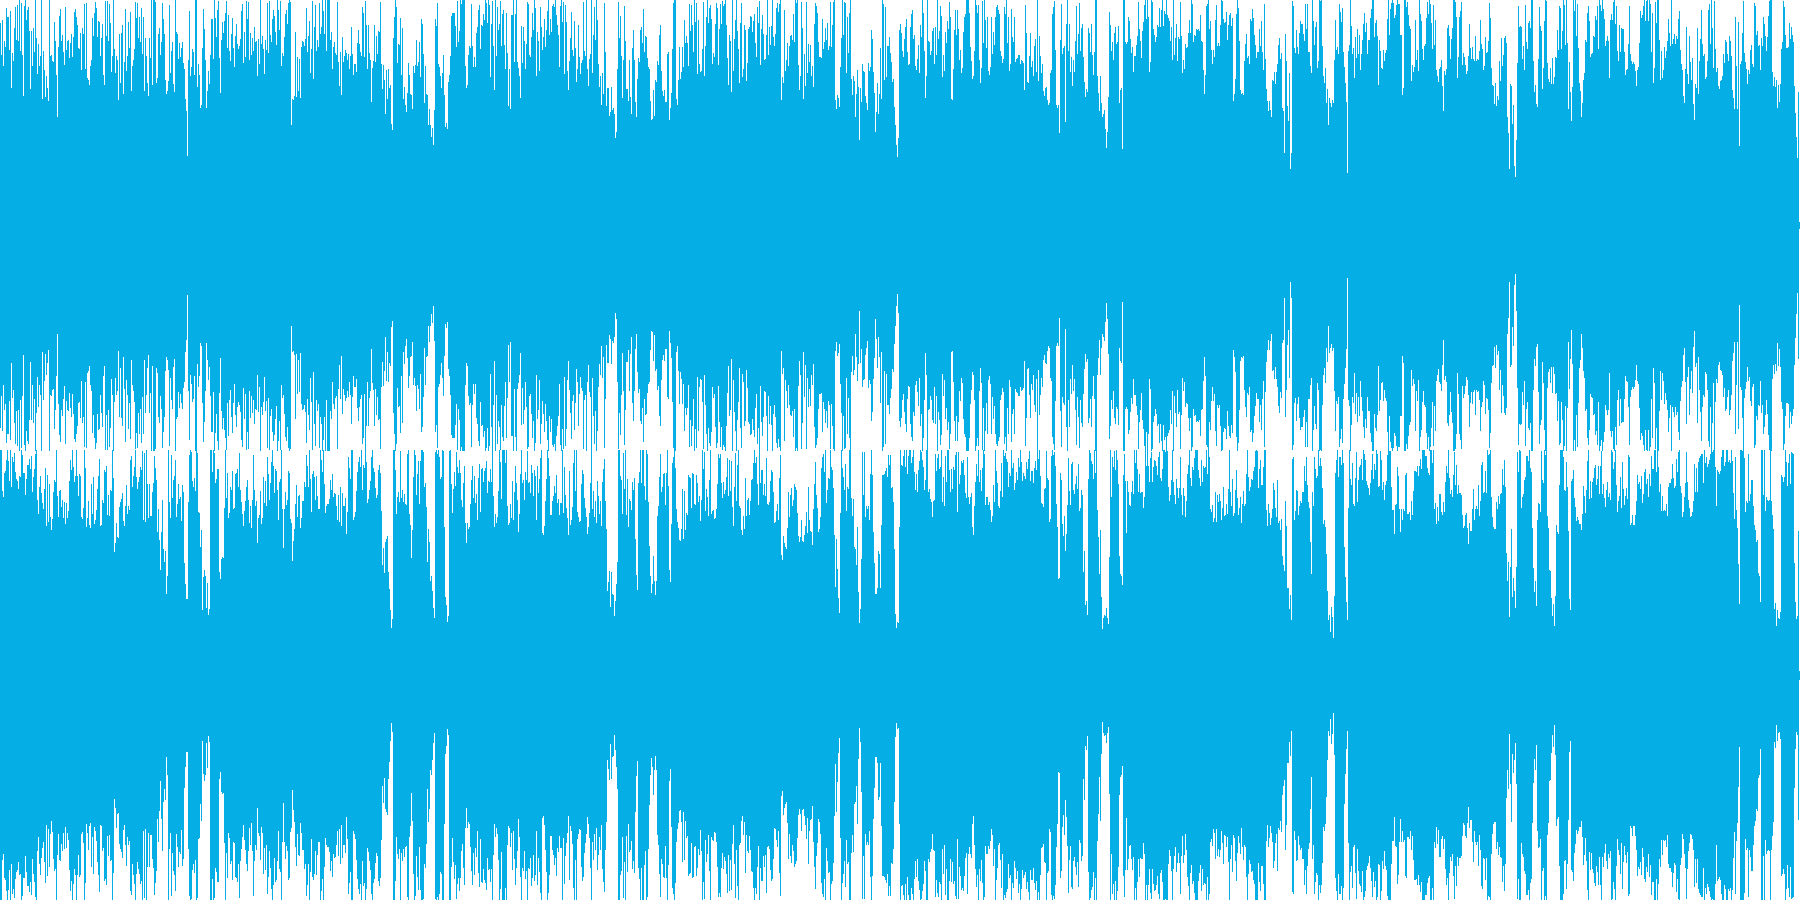 8bitピコピコ(つなぎ2)の再生済みの波形